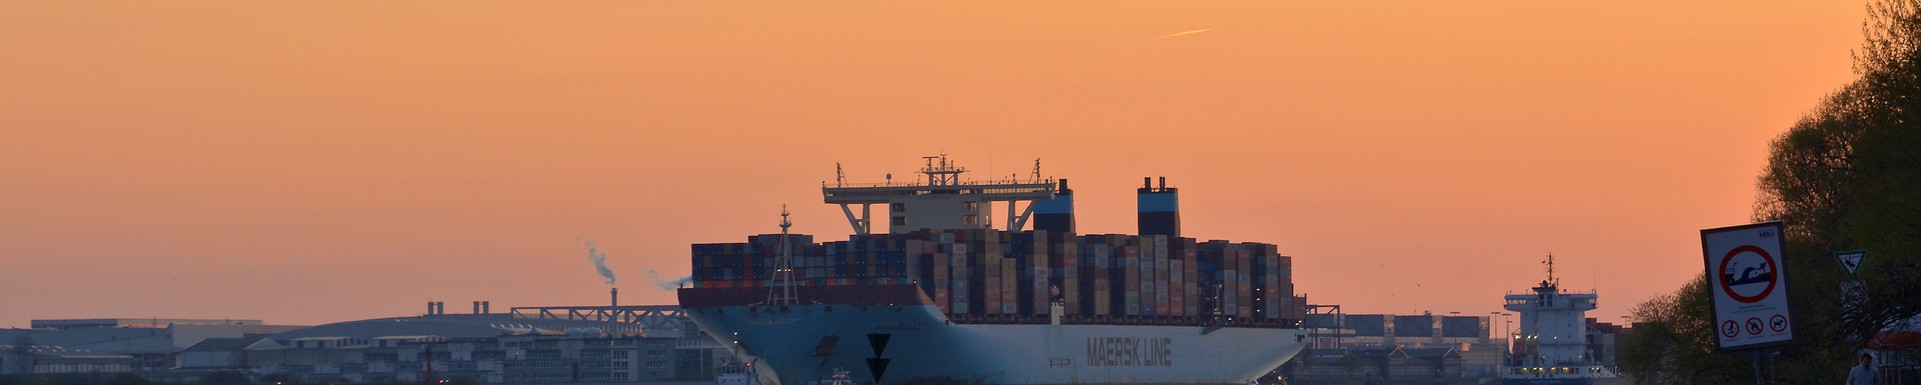 Containership 'Mathilde Maersk' in Hamburg - BMK_1689.jpg